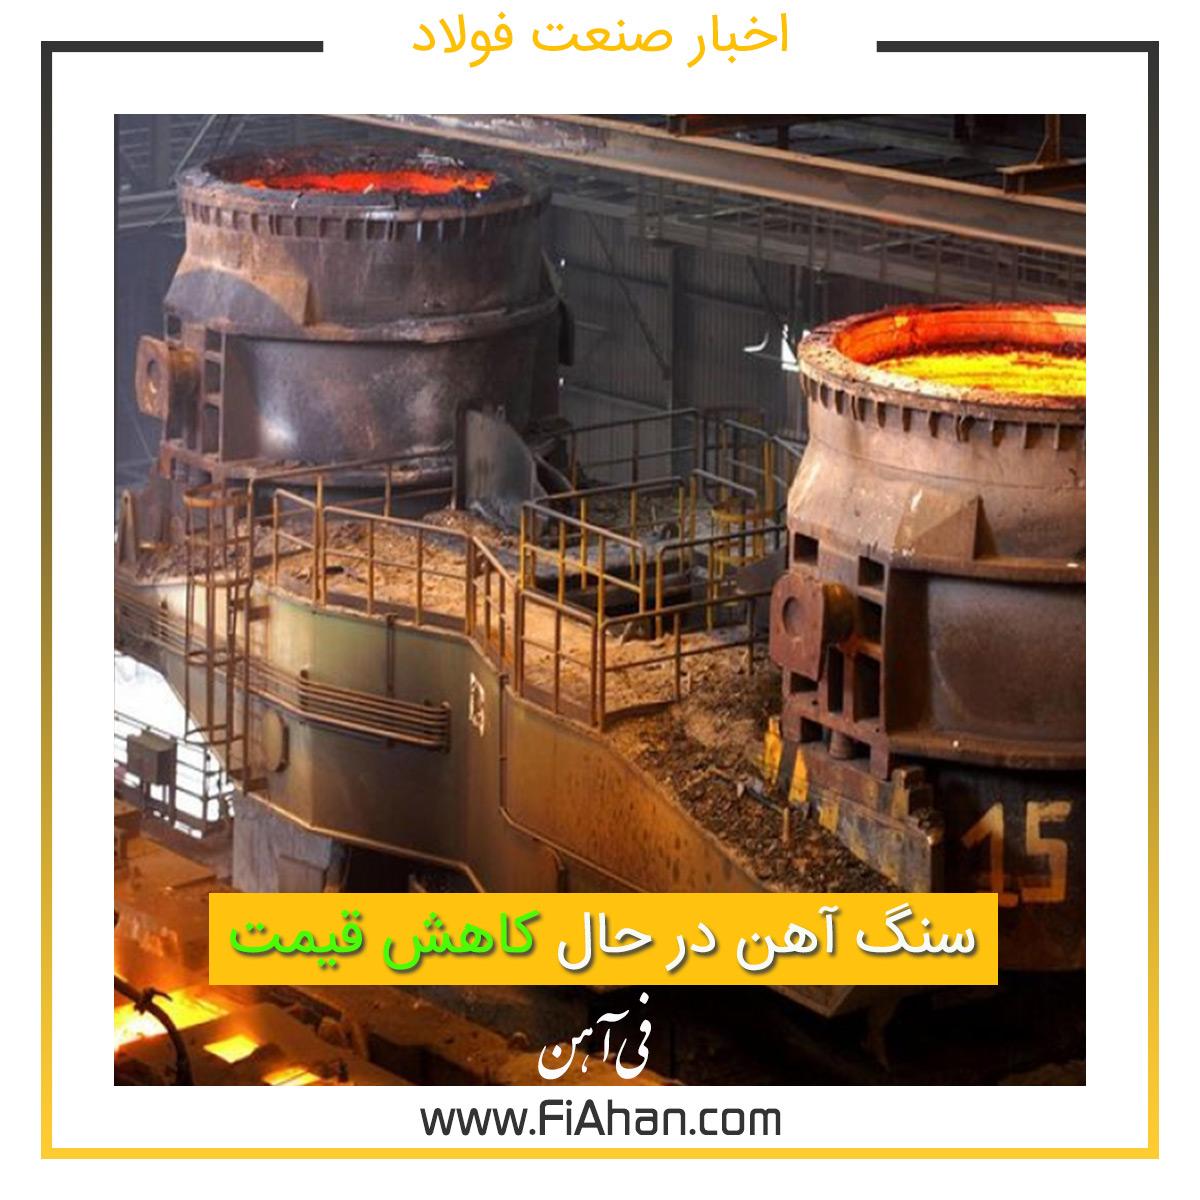 سنگ آهن در حال کاهش قیمت